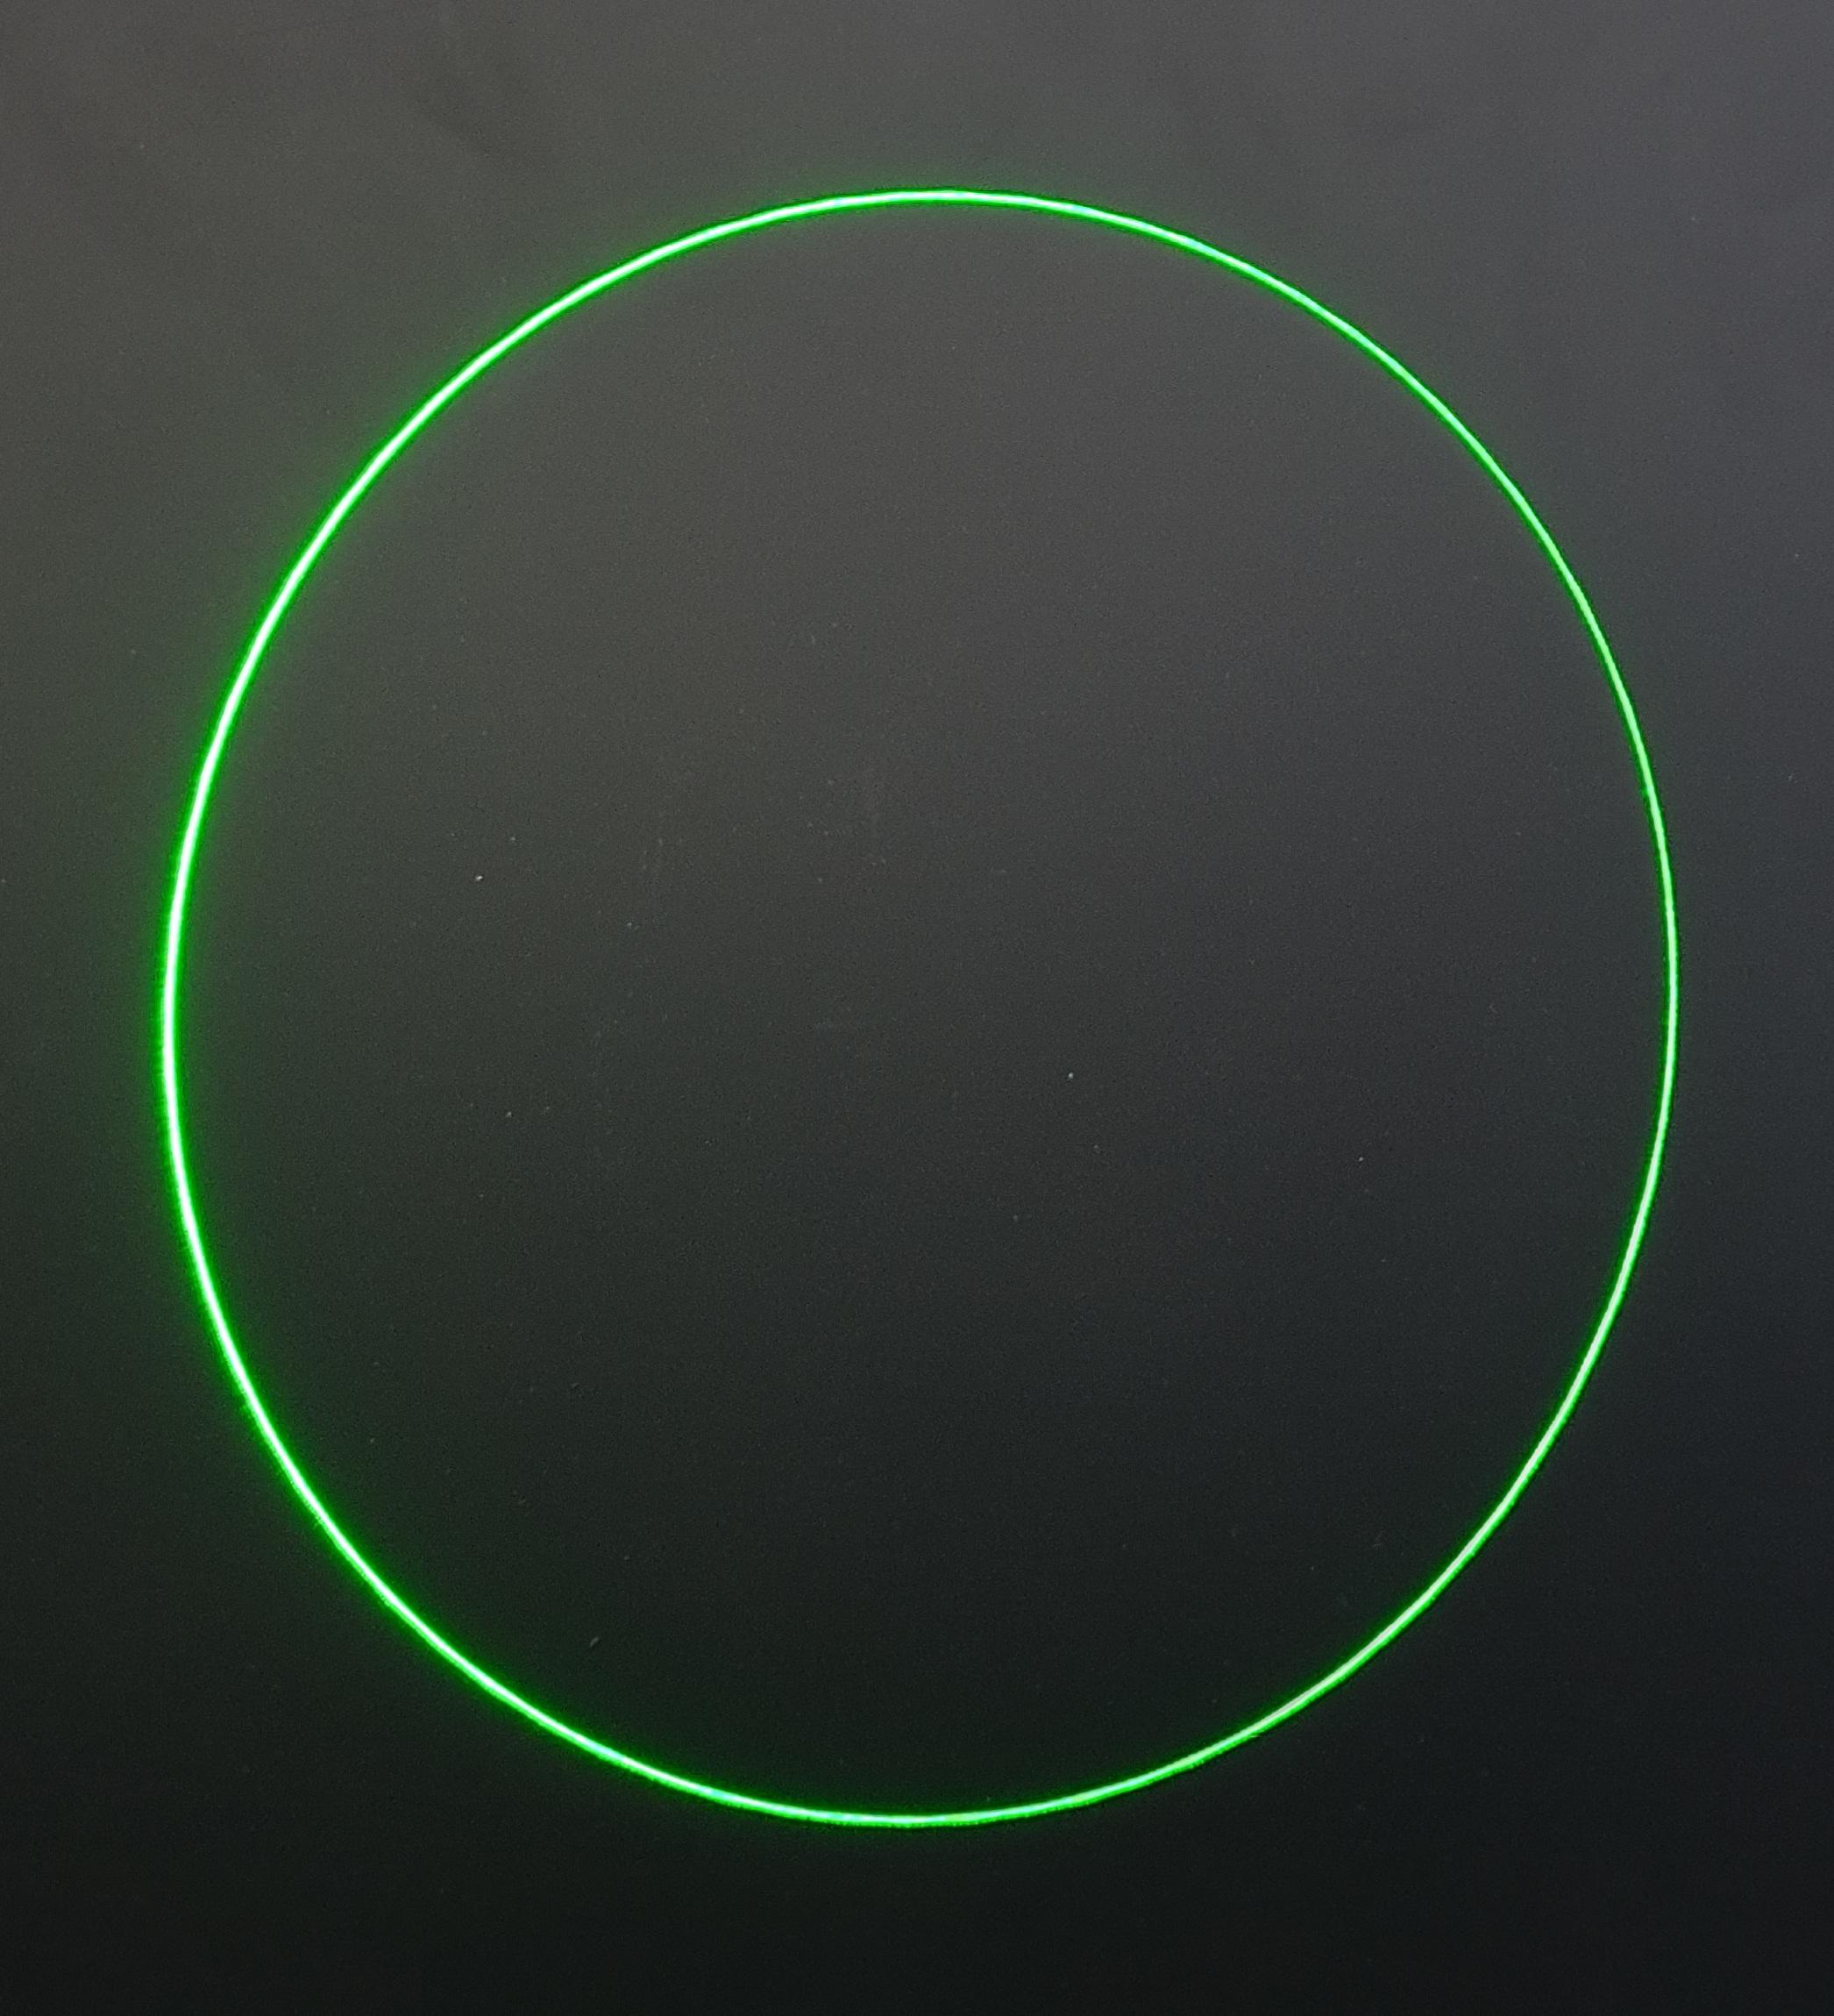 7i96-xy2mod-test_circle_vel.jpg